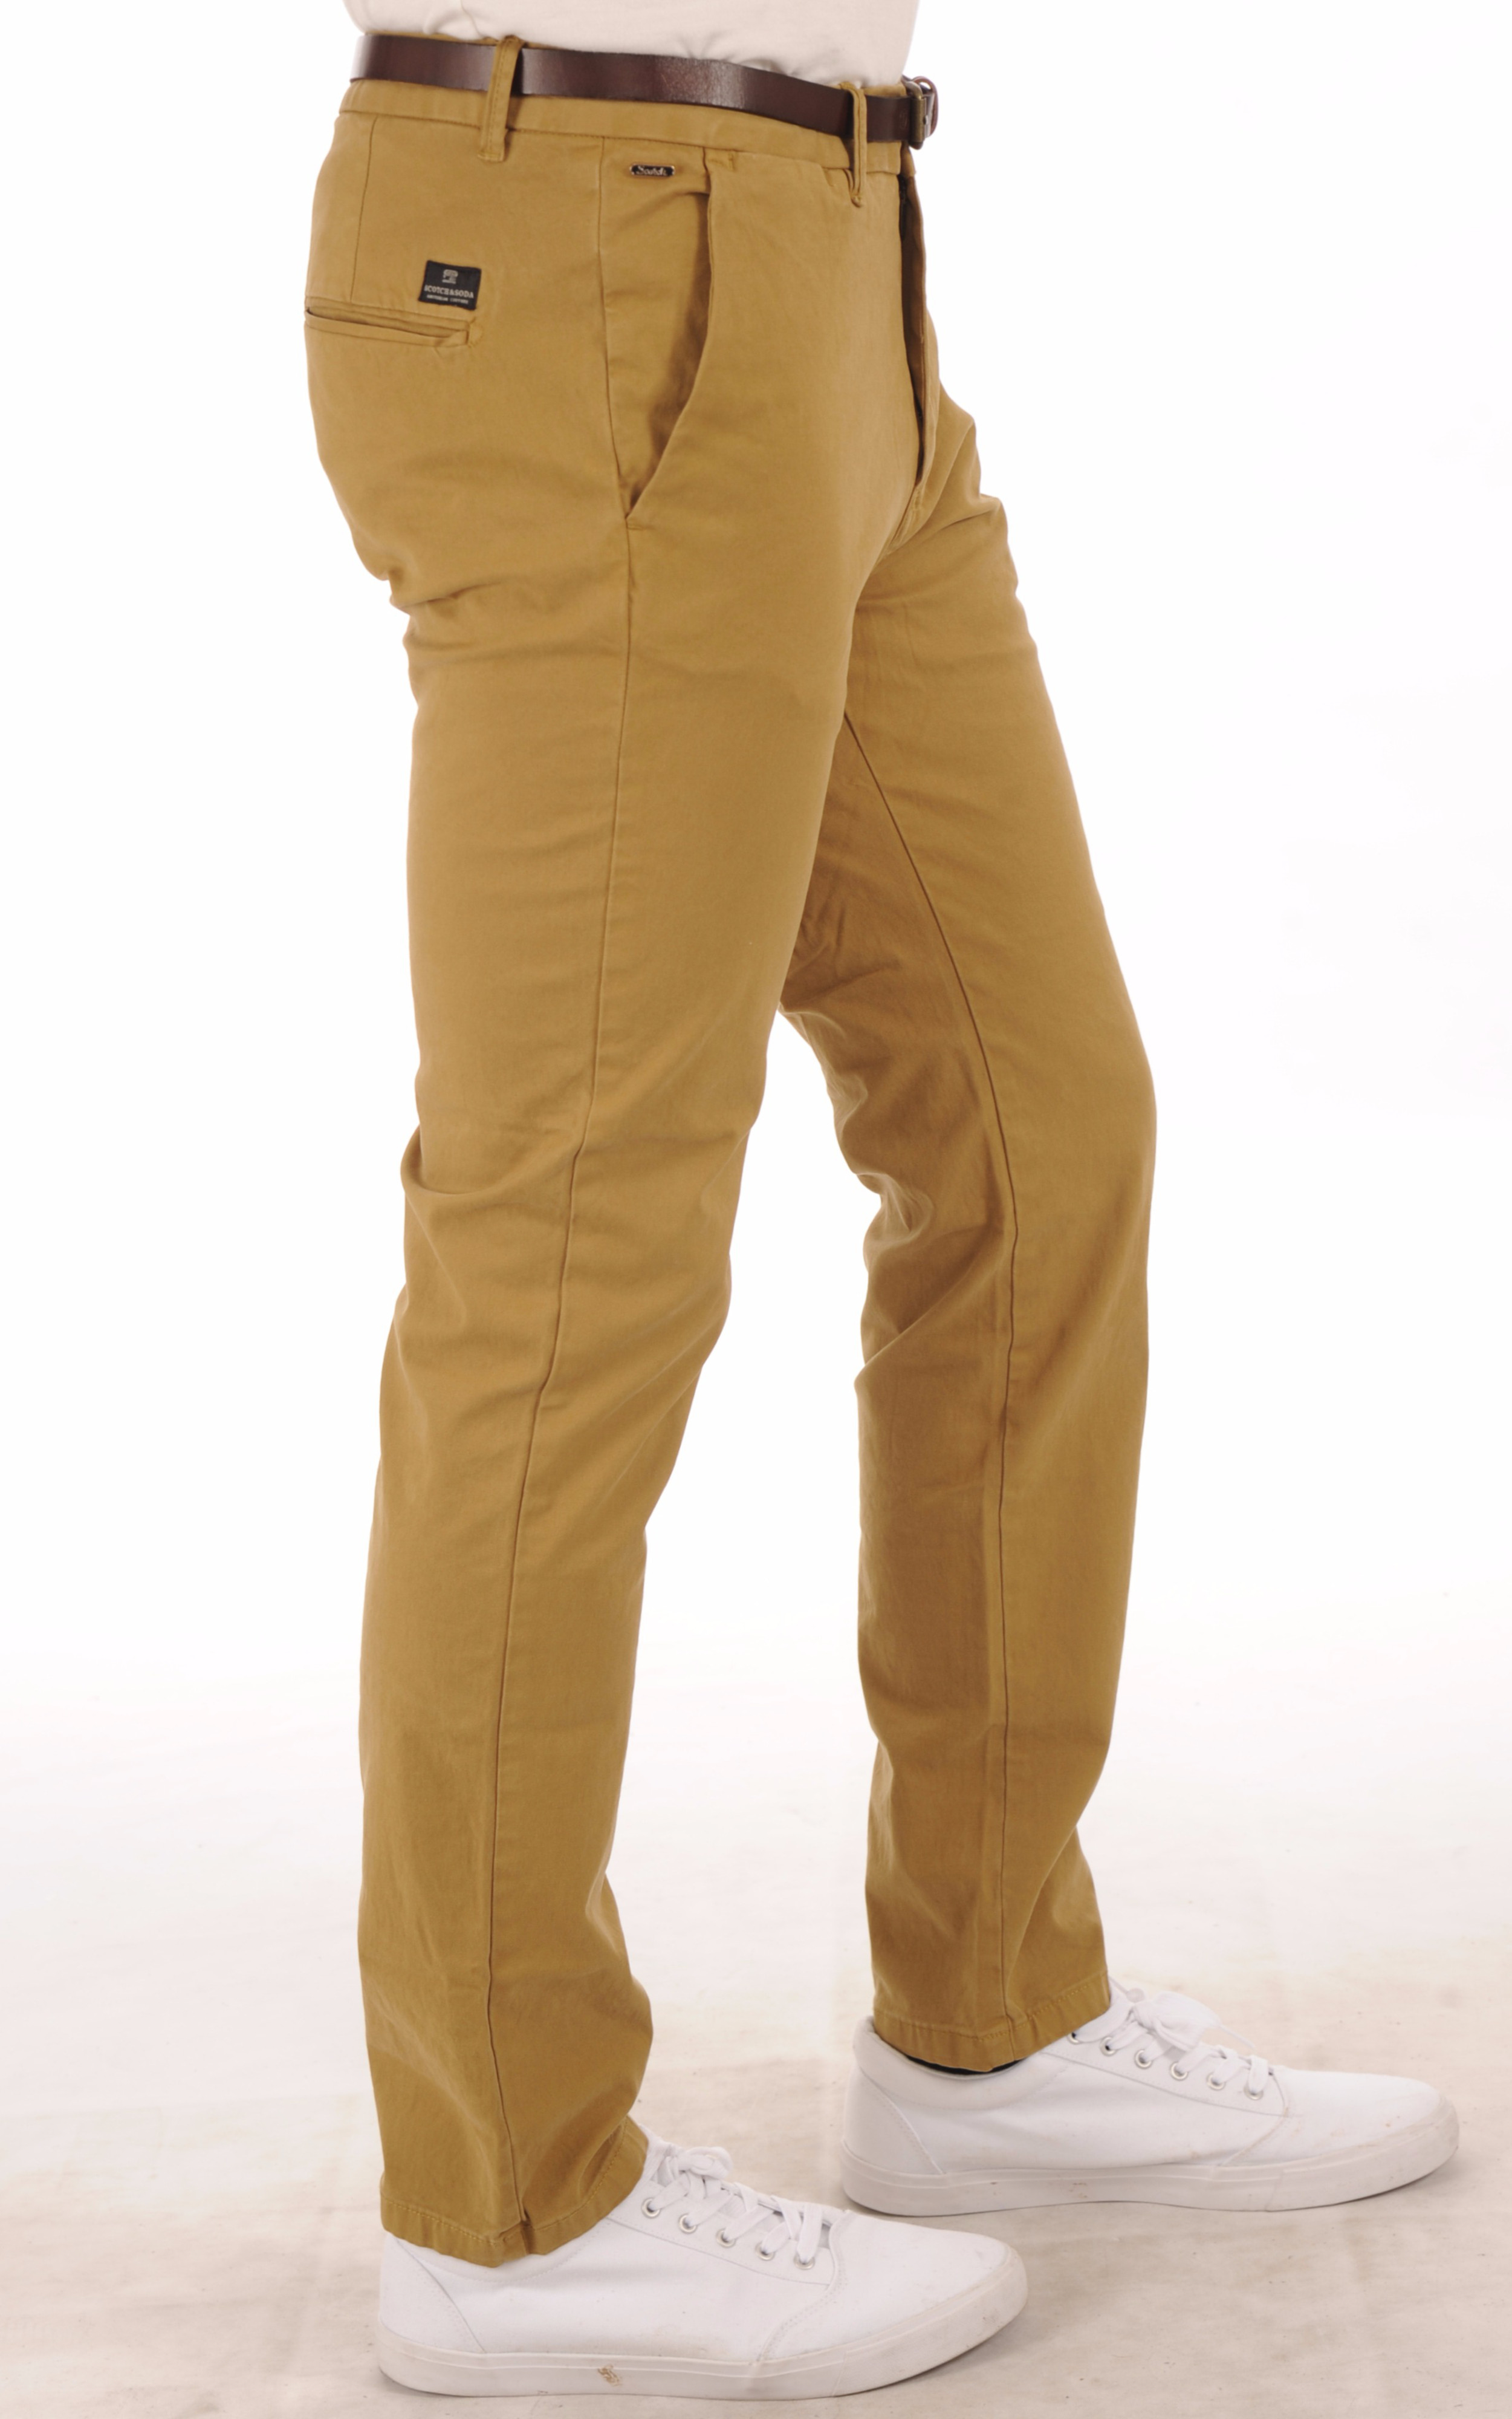 Pantalon Chino Beige Homme Scotch & Soda